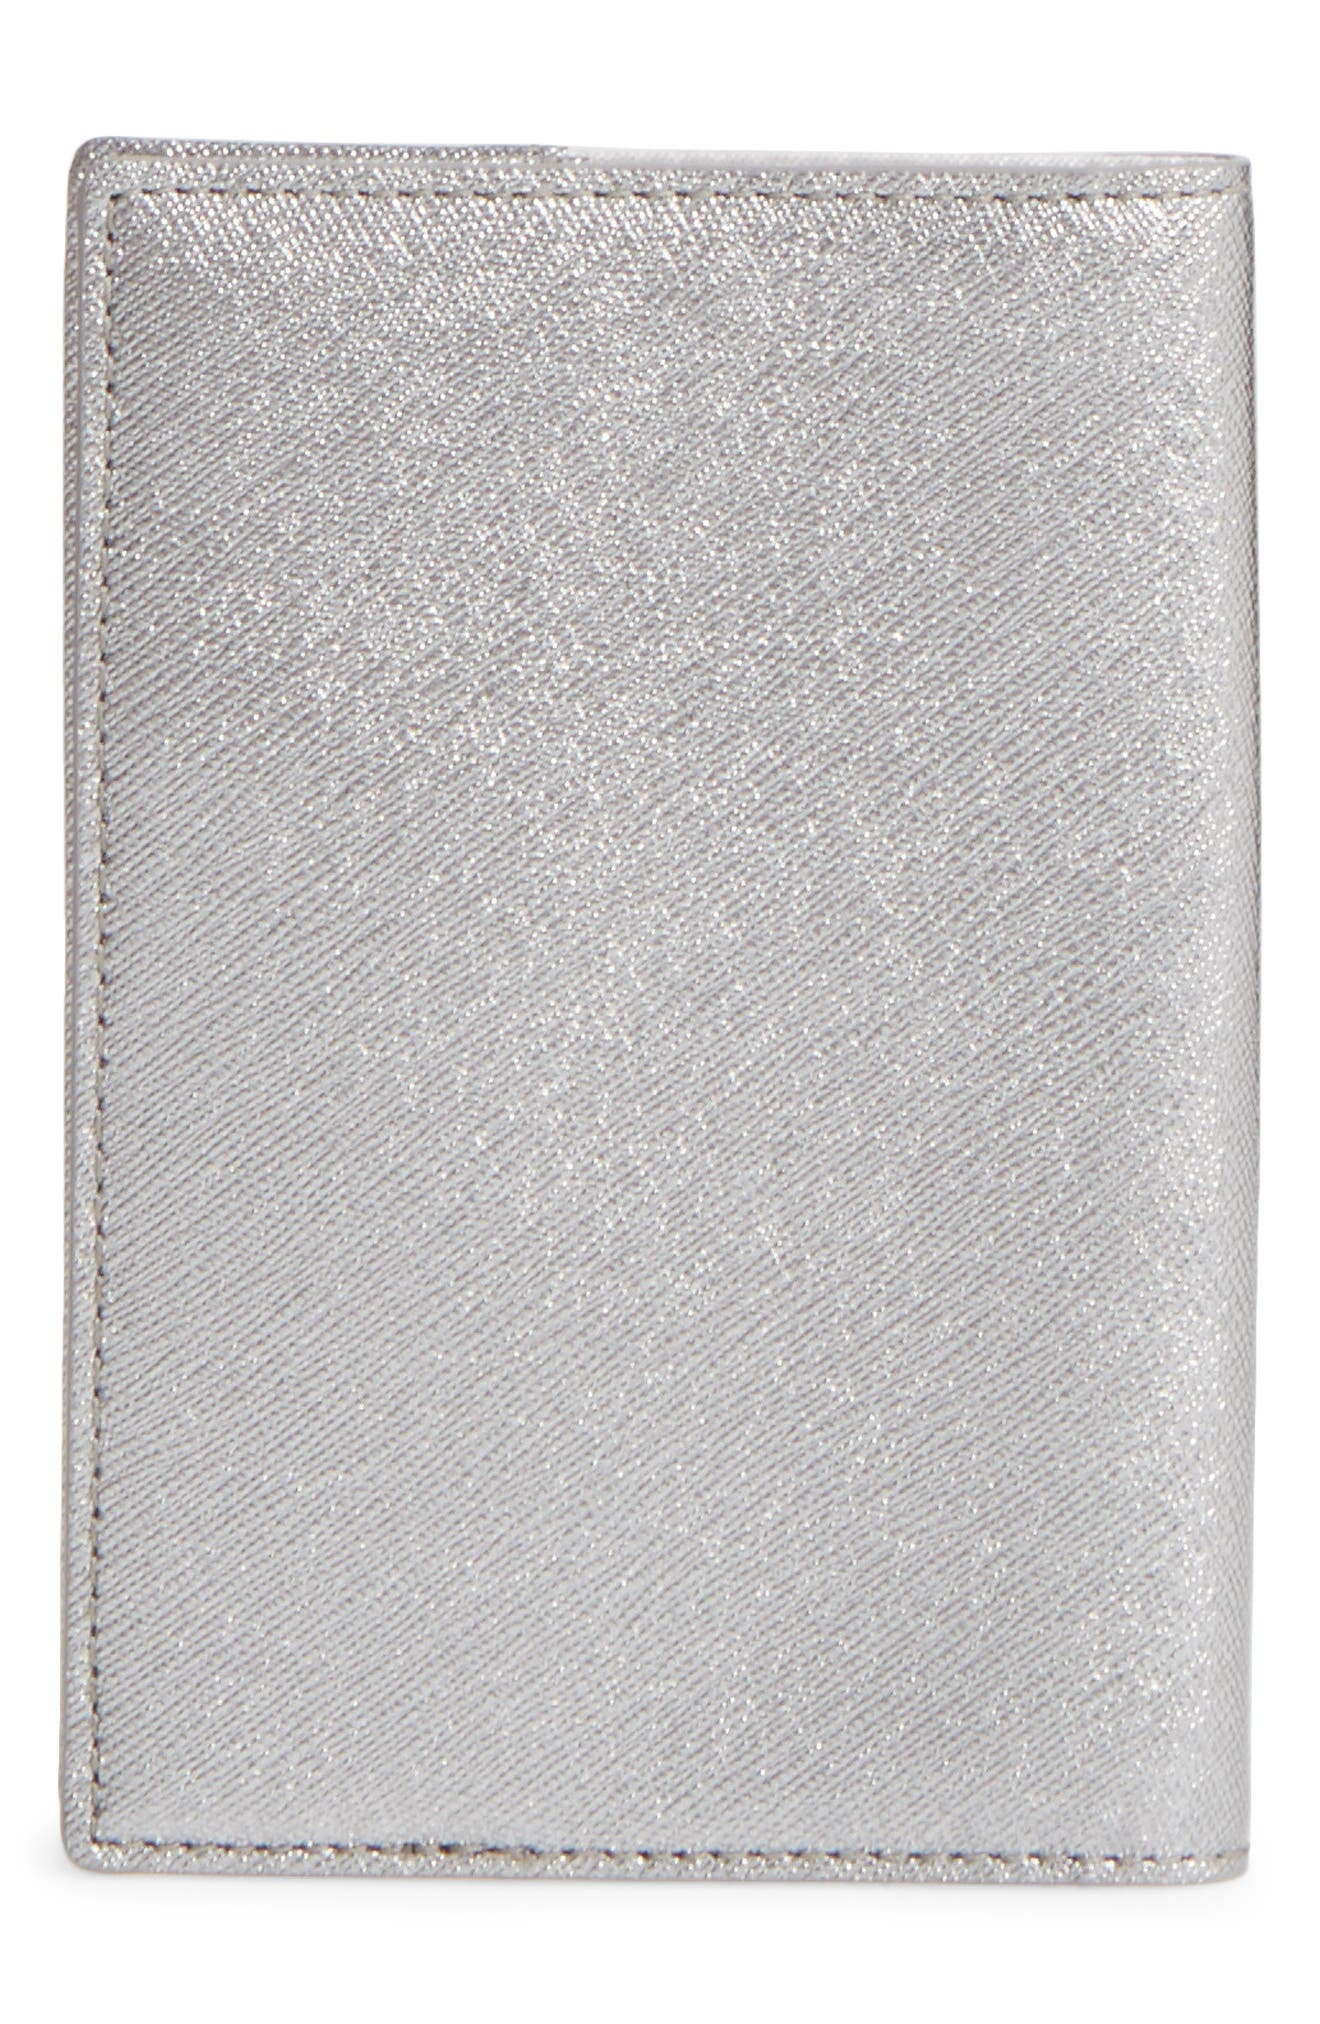 Alternate Image 4  - kate spade new york starbright owl leather passport case